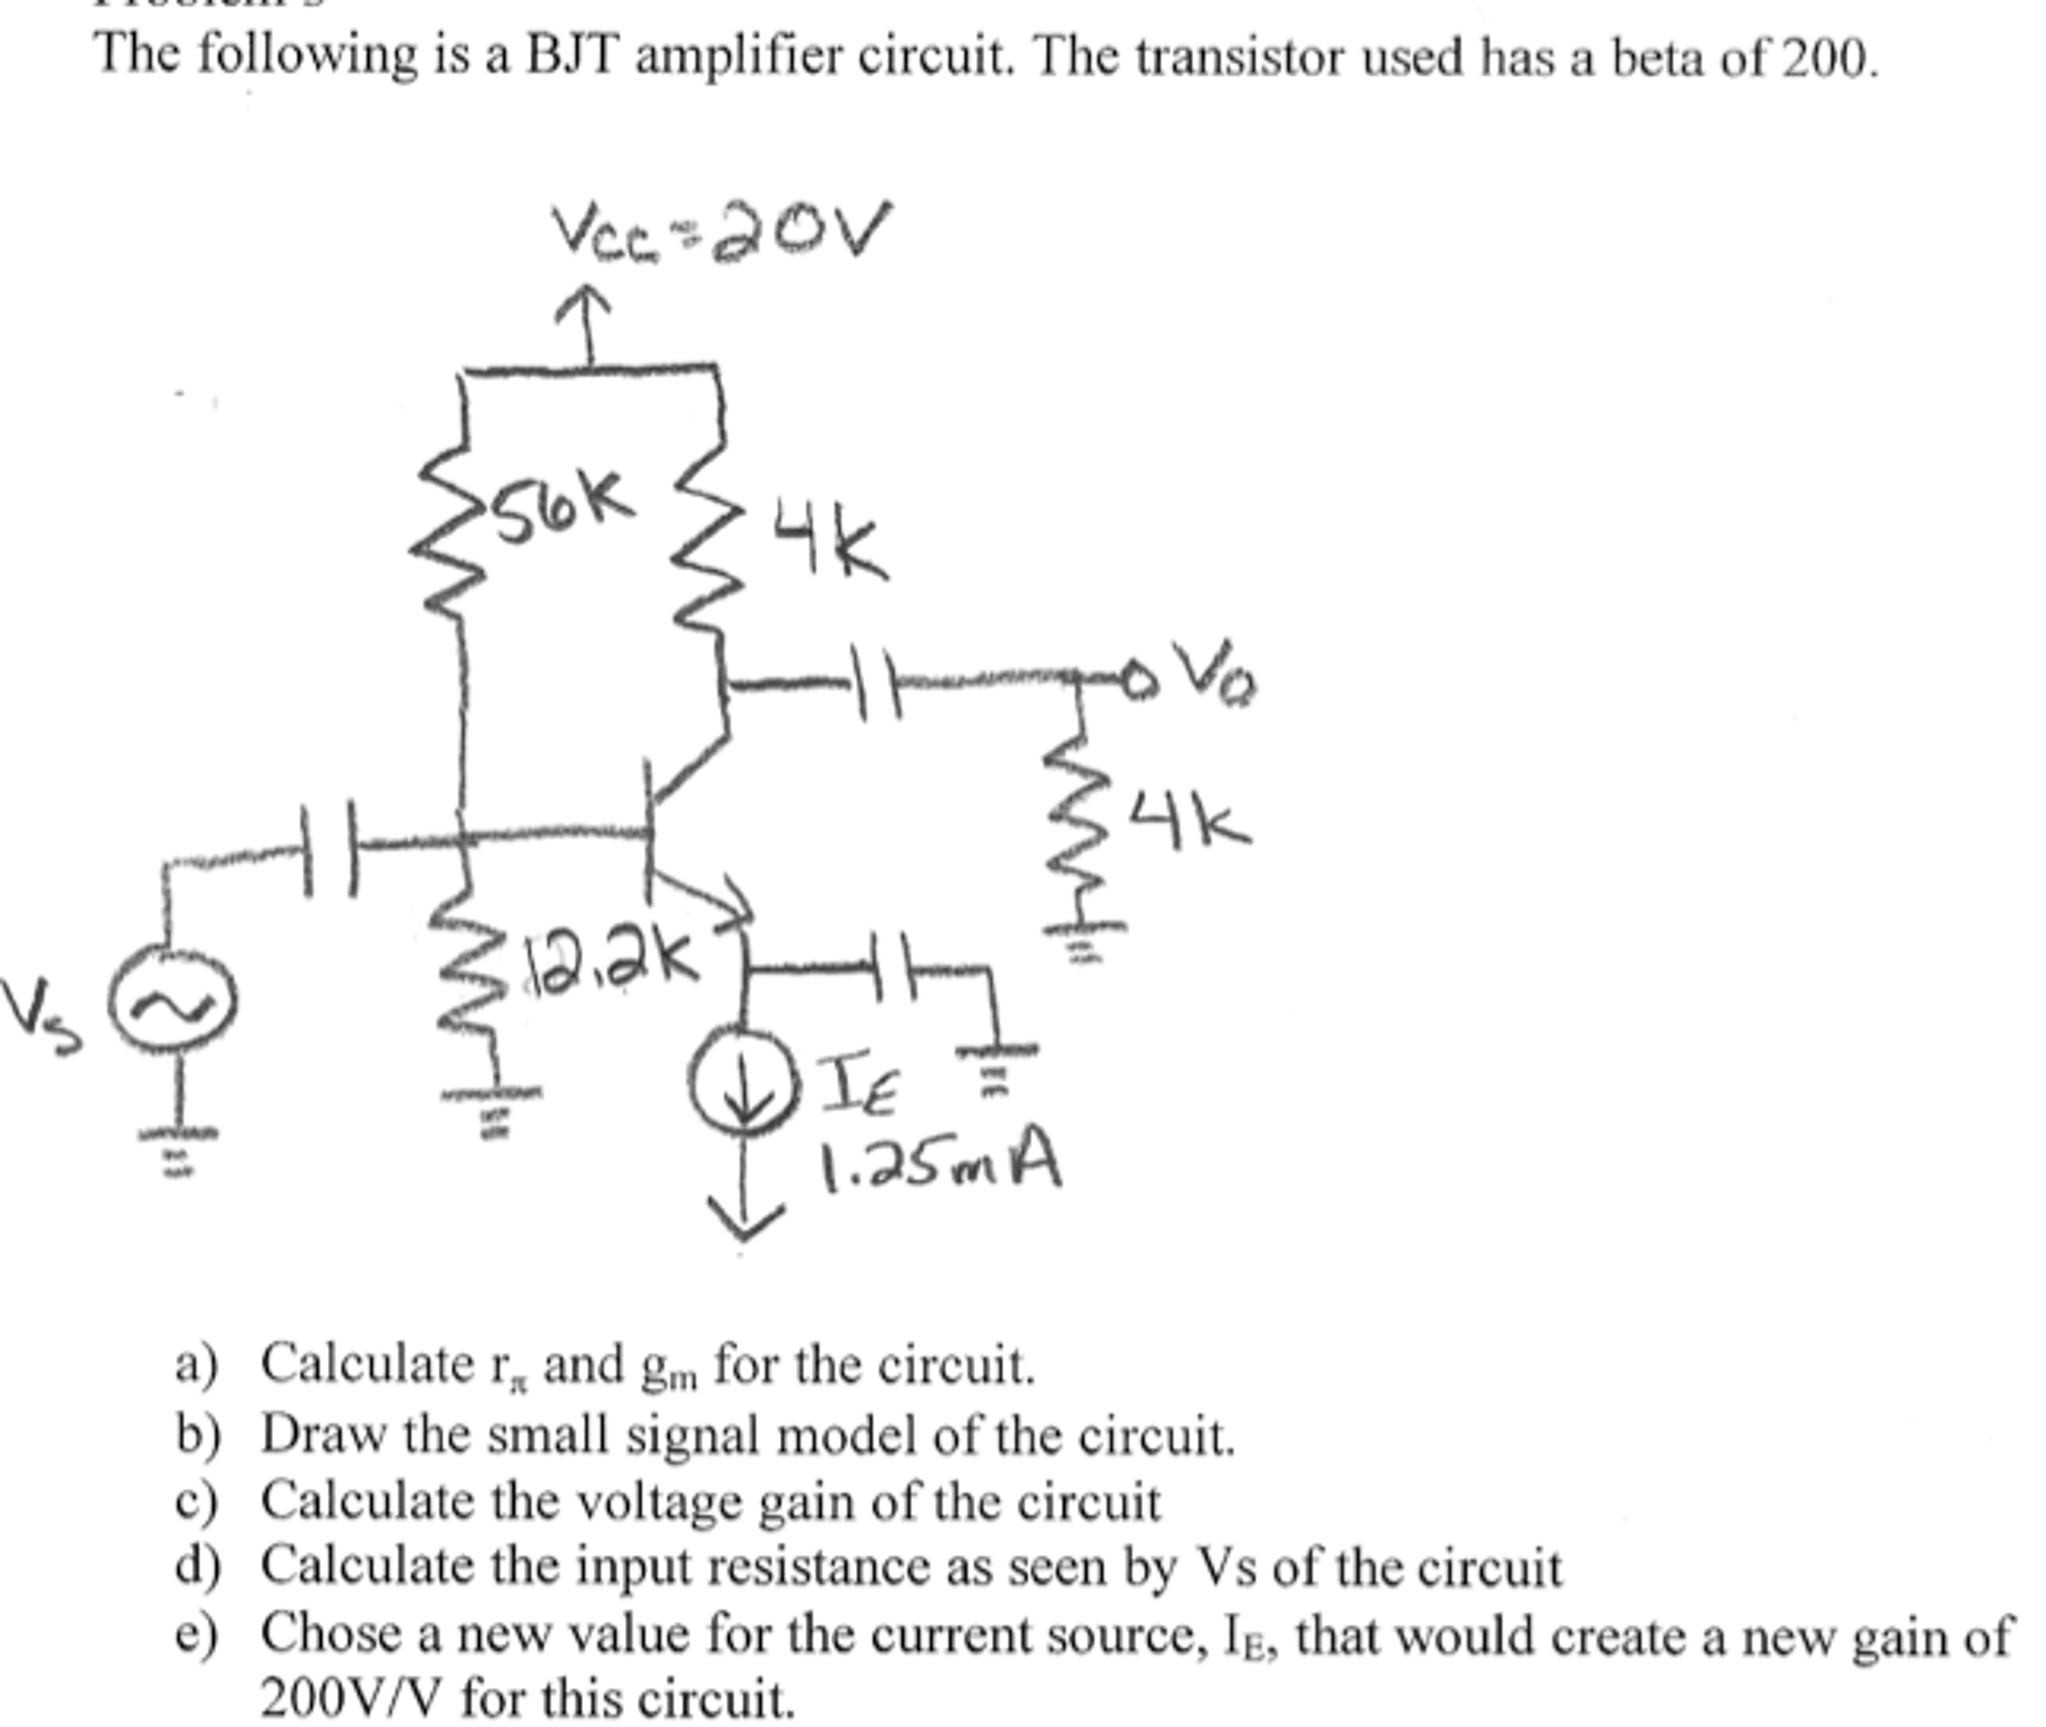 Snap T20 Wiring Diagram Friendship Bracelet Diagrams Current Amplifier Amplifiercircuit Circuit Seekiccom Solved The Following Is A Bjt Tran